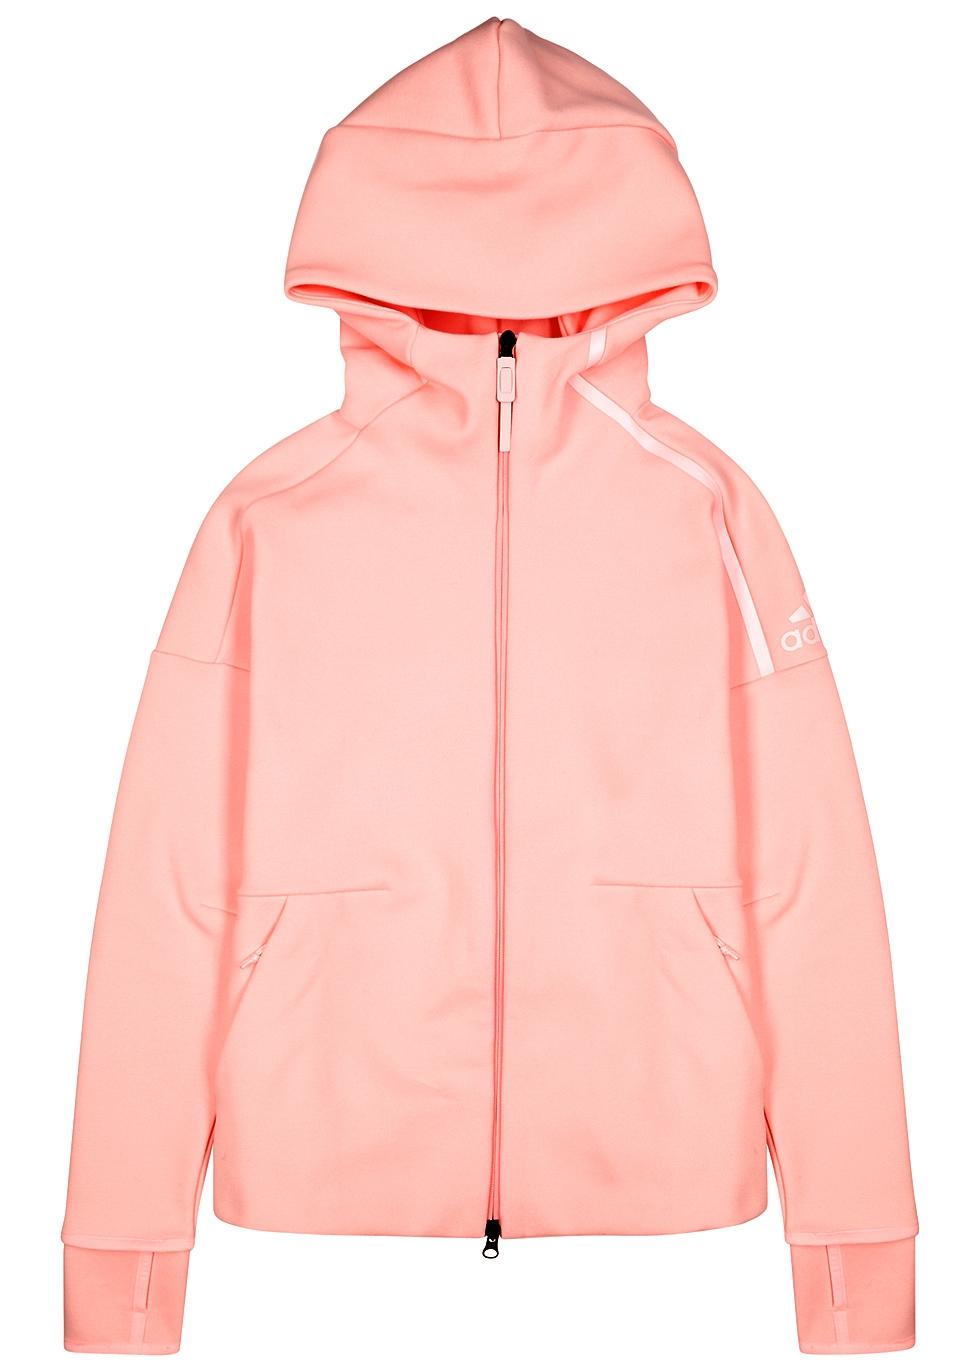 ADIDAS TRAINING Adidas Training Z.N.E. 2.0 Cotton-Blend Sweatshirt in Light Pink